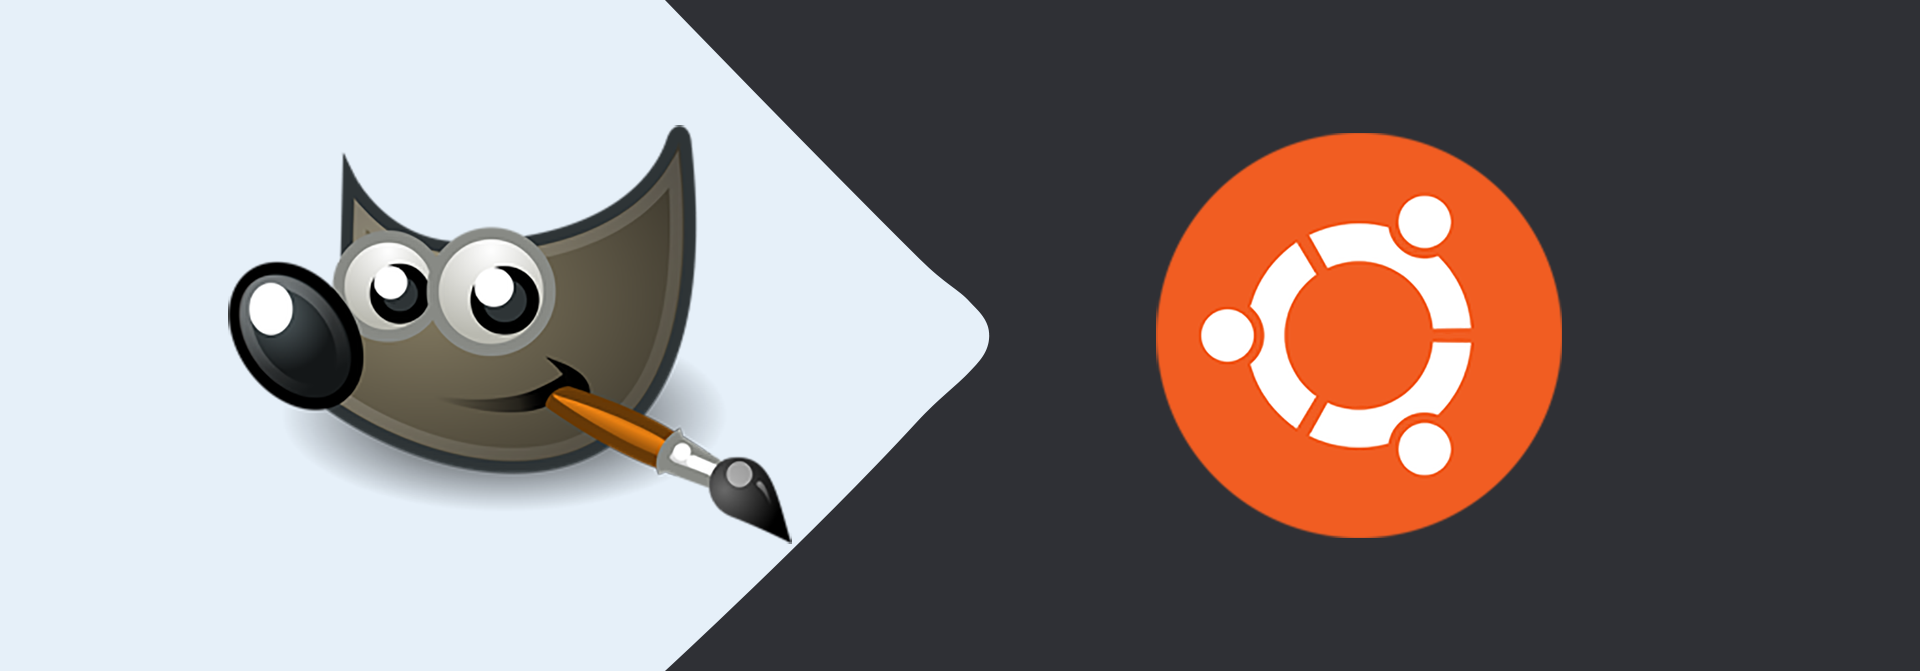 How To Install GIMP On Ubuntu 18.04 LTS